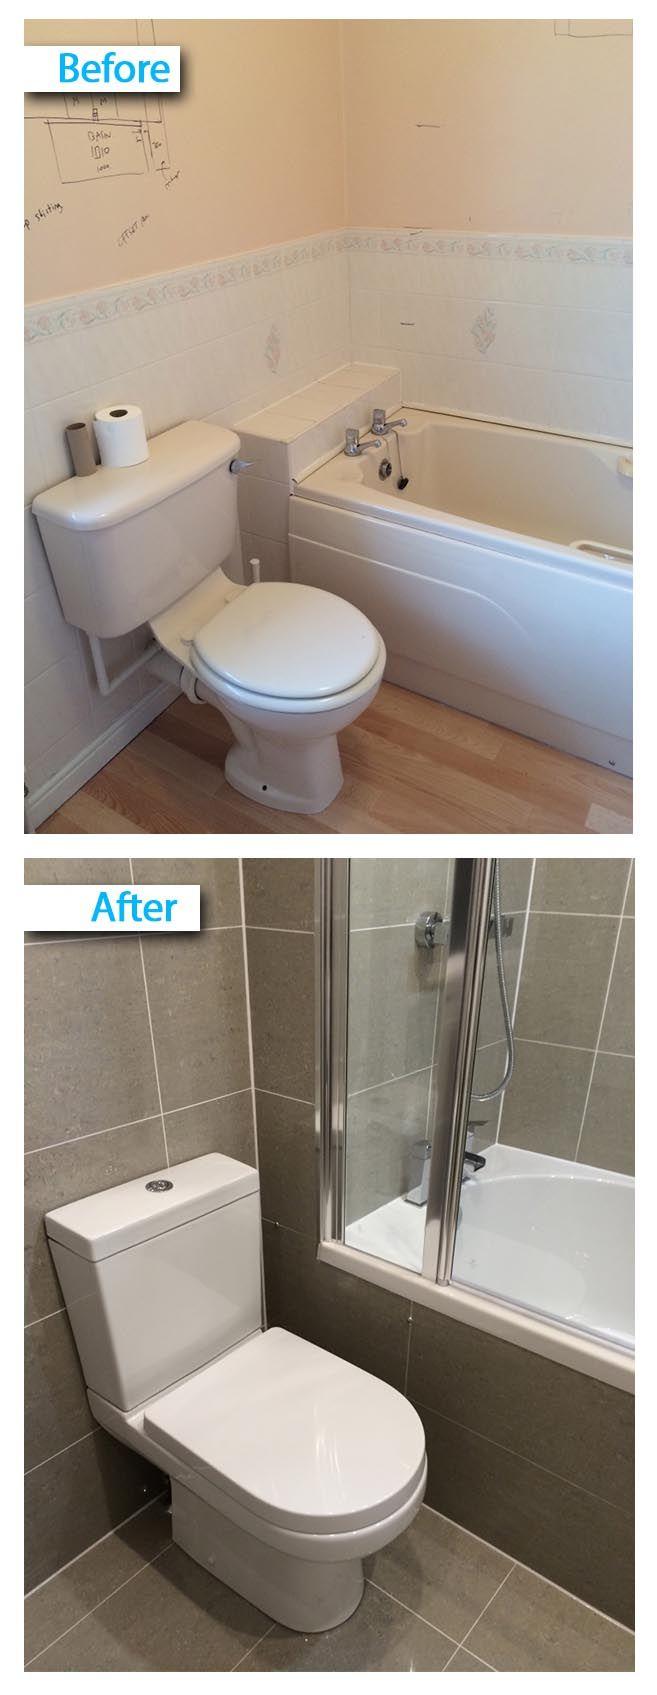 Full bathroom installation - Full Bathroom Renovation W Bath Screen Installation By By Uk Bathroom Guru See More